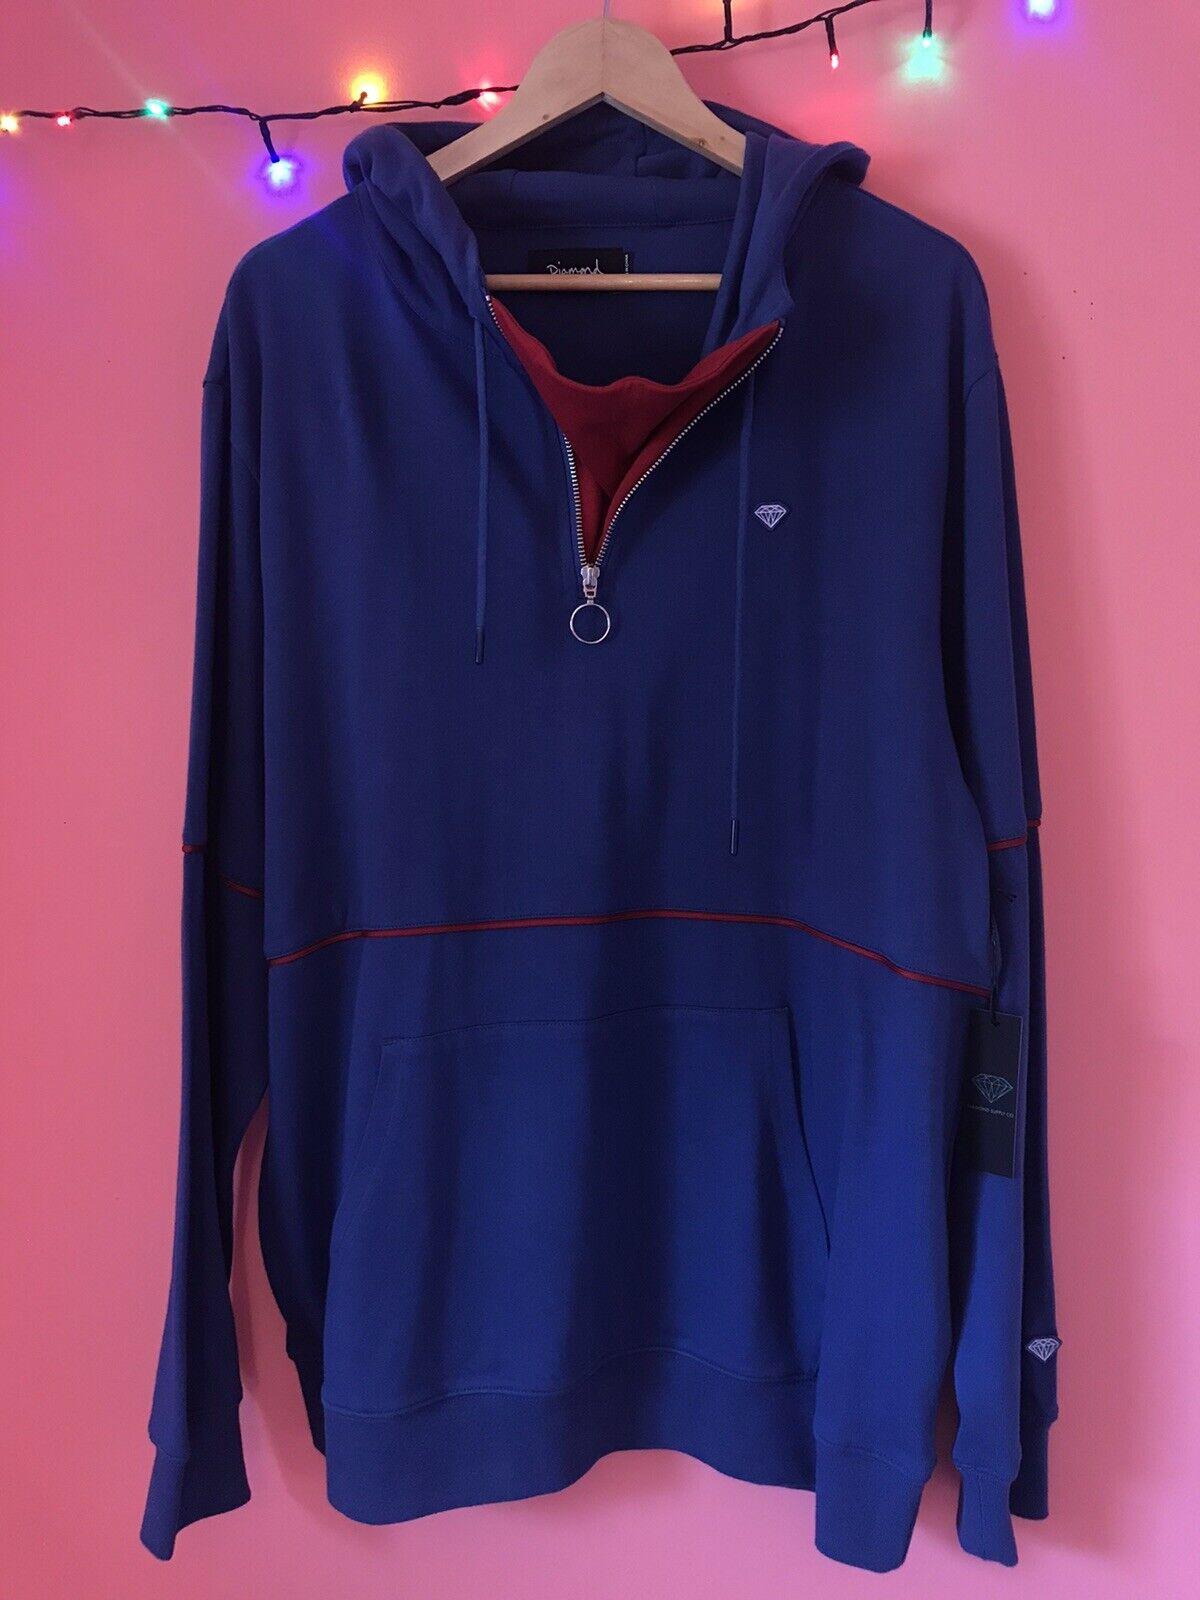 Diamond Supply Co Hoodie XL Men's Blue/Red